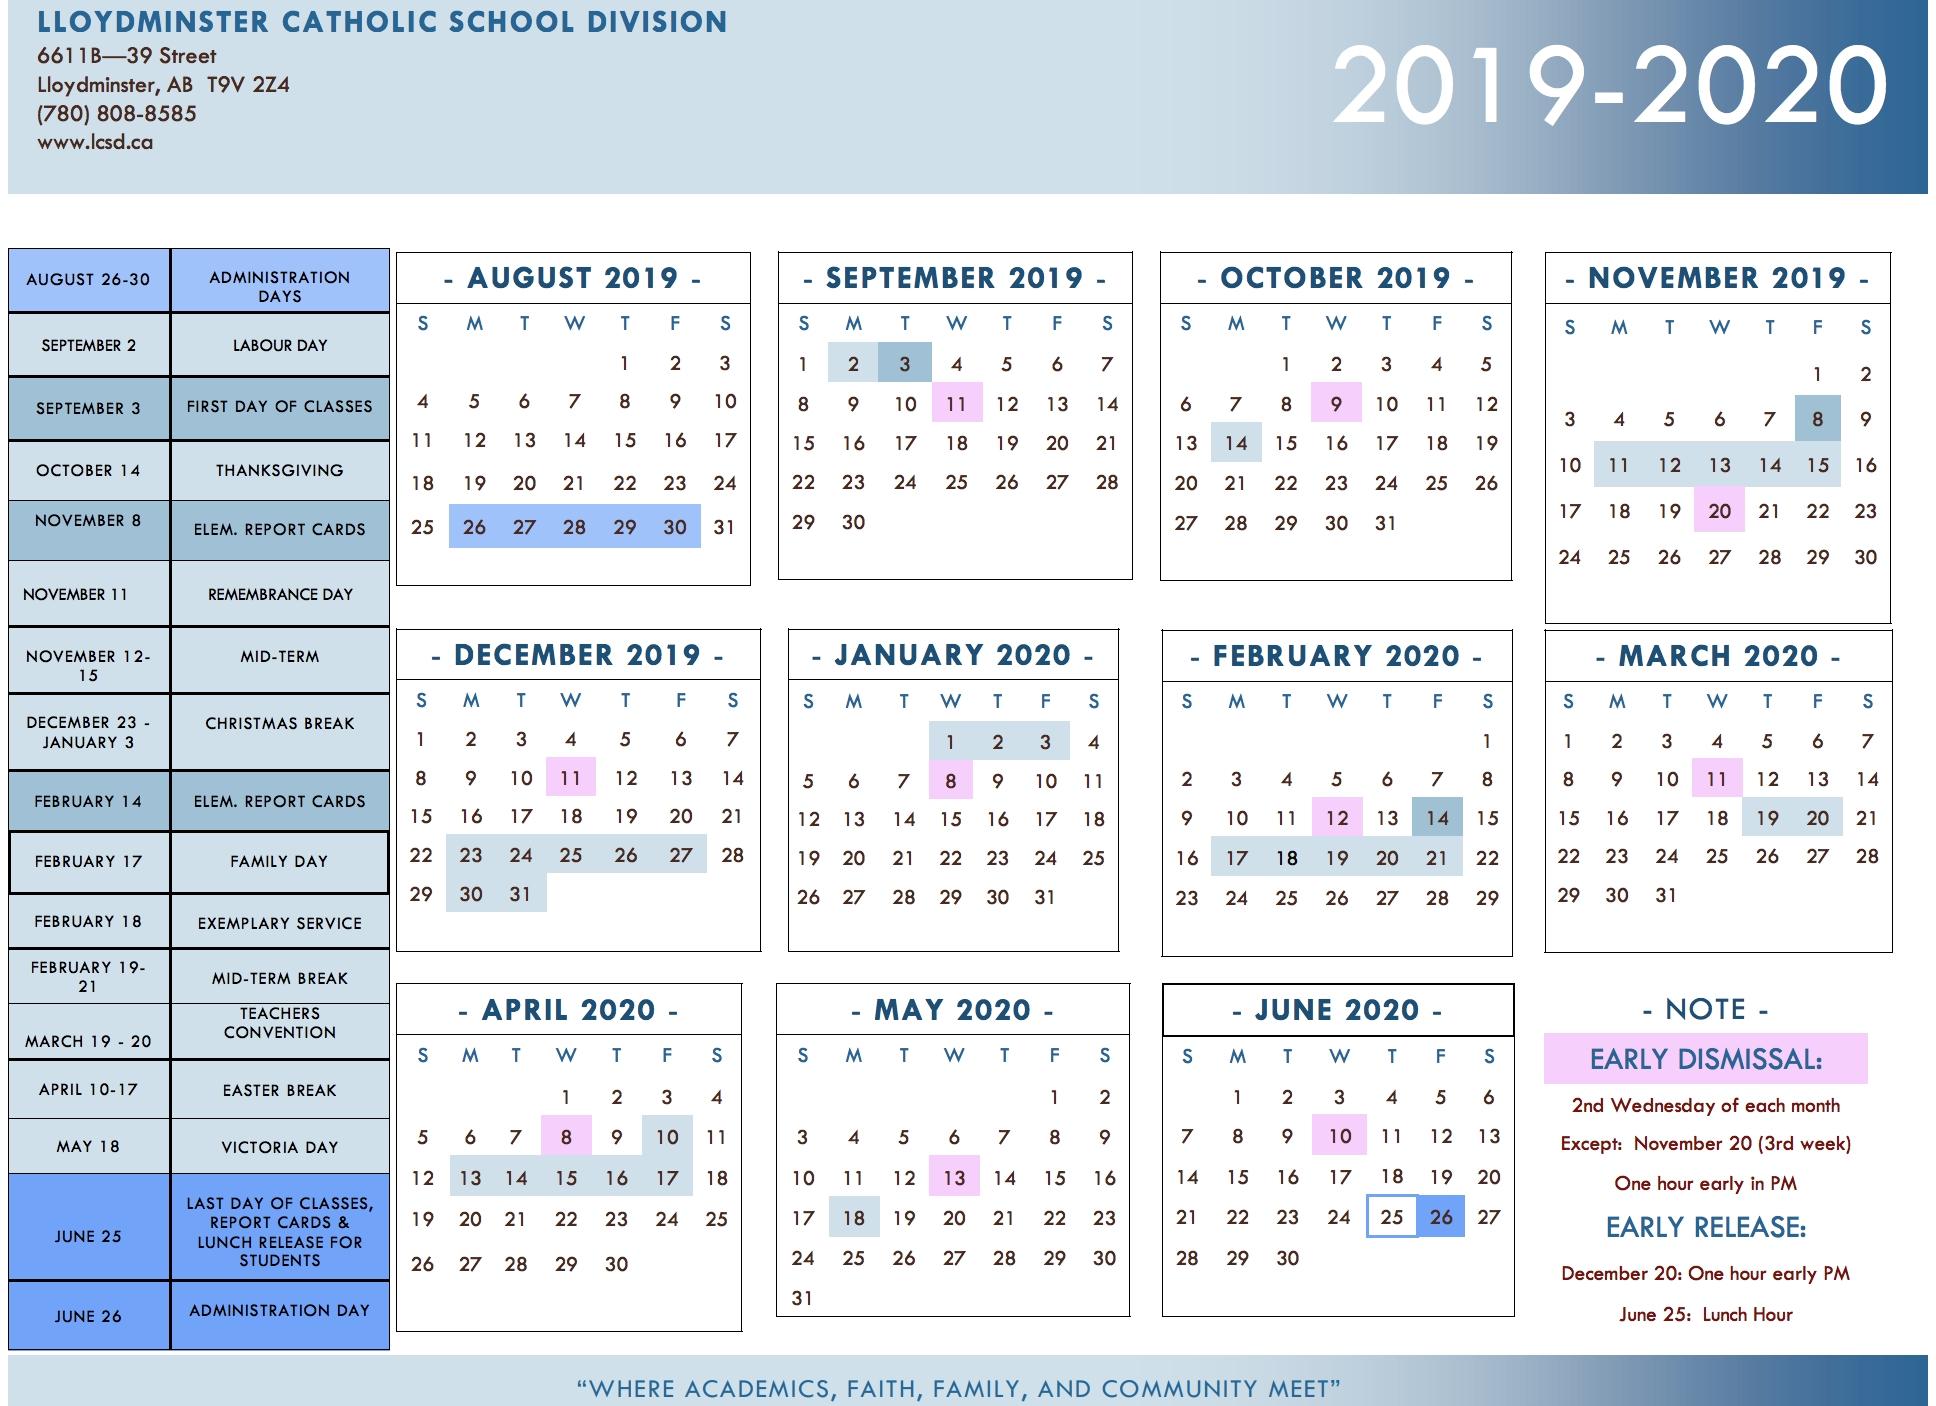 Division Calendar - Lloydminster Catholic School Division-America School Holidays 2020 Calendar